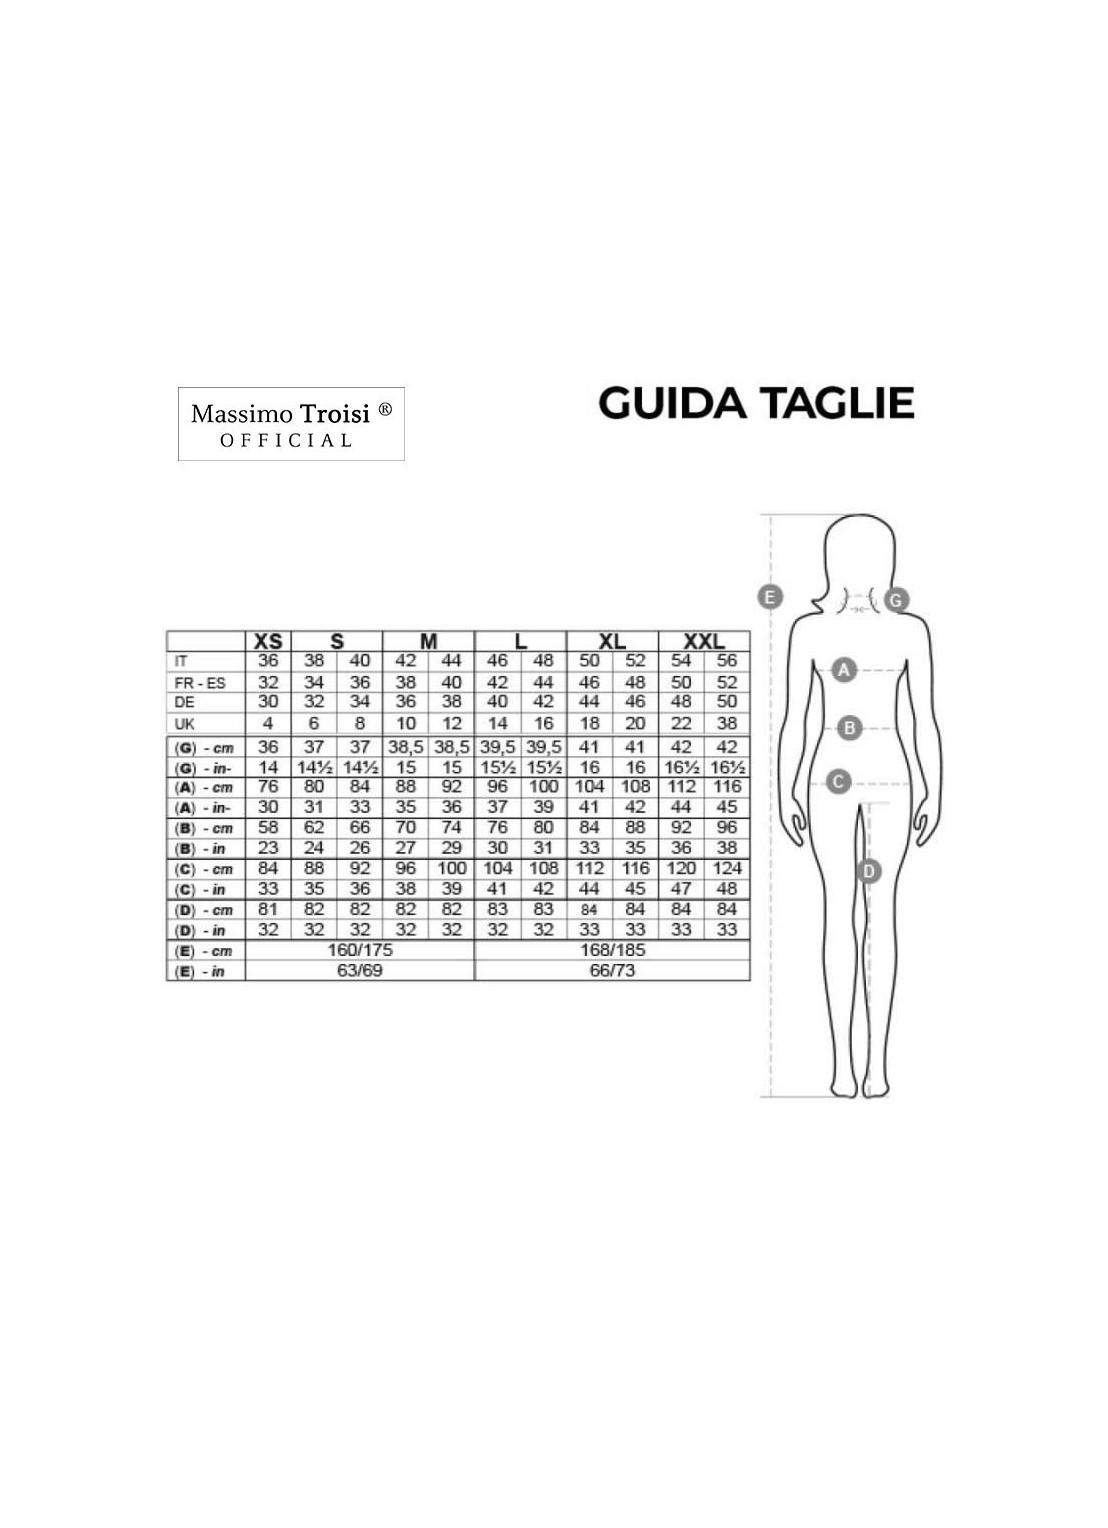 Tazza Mug Ligabue - La storia